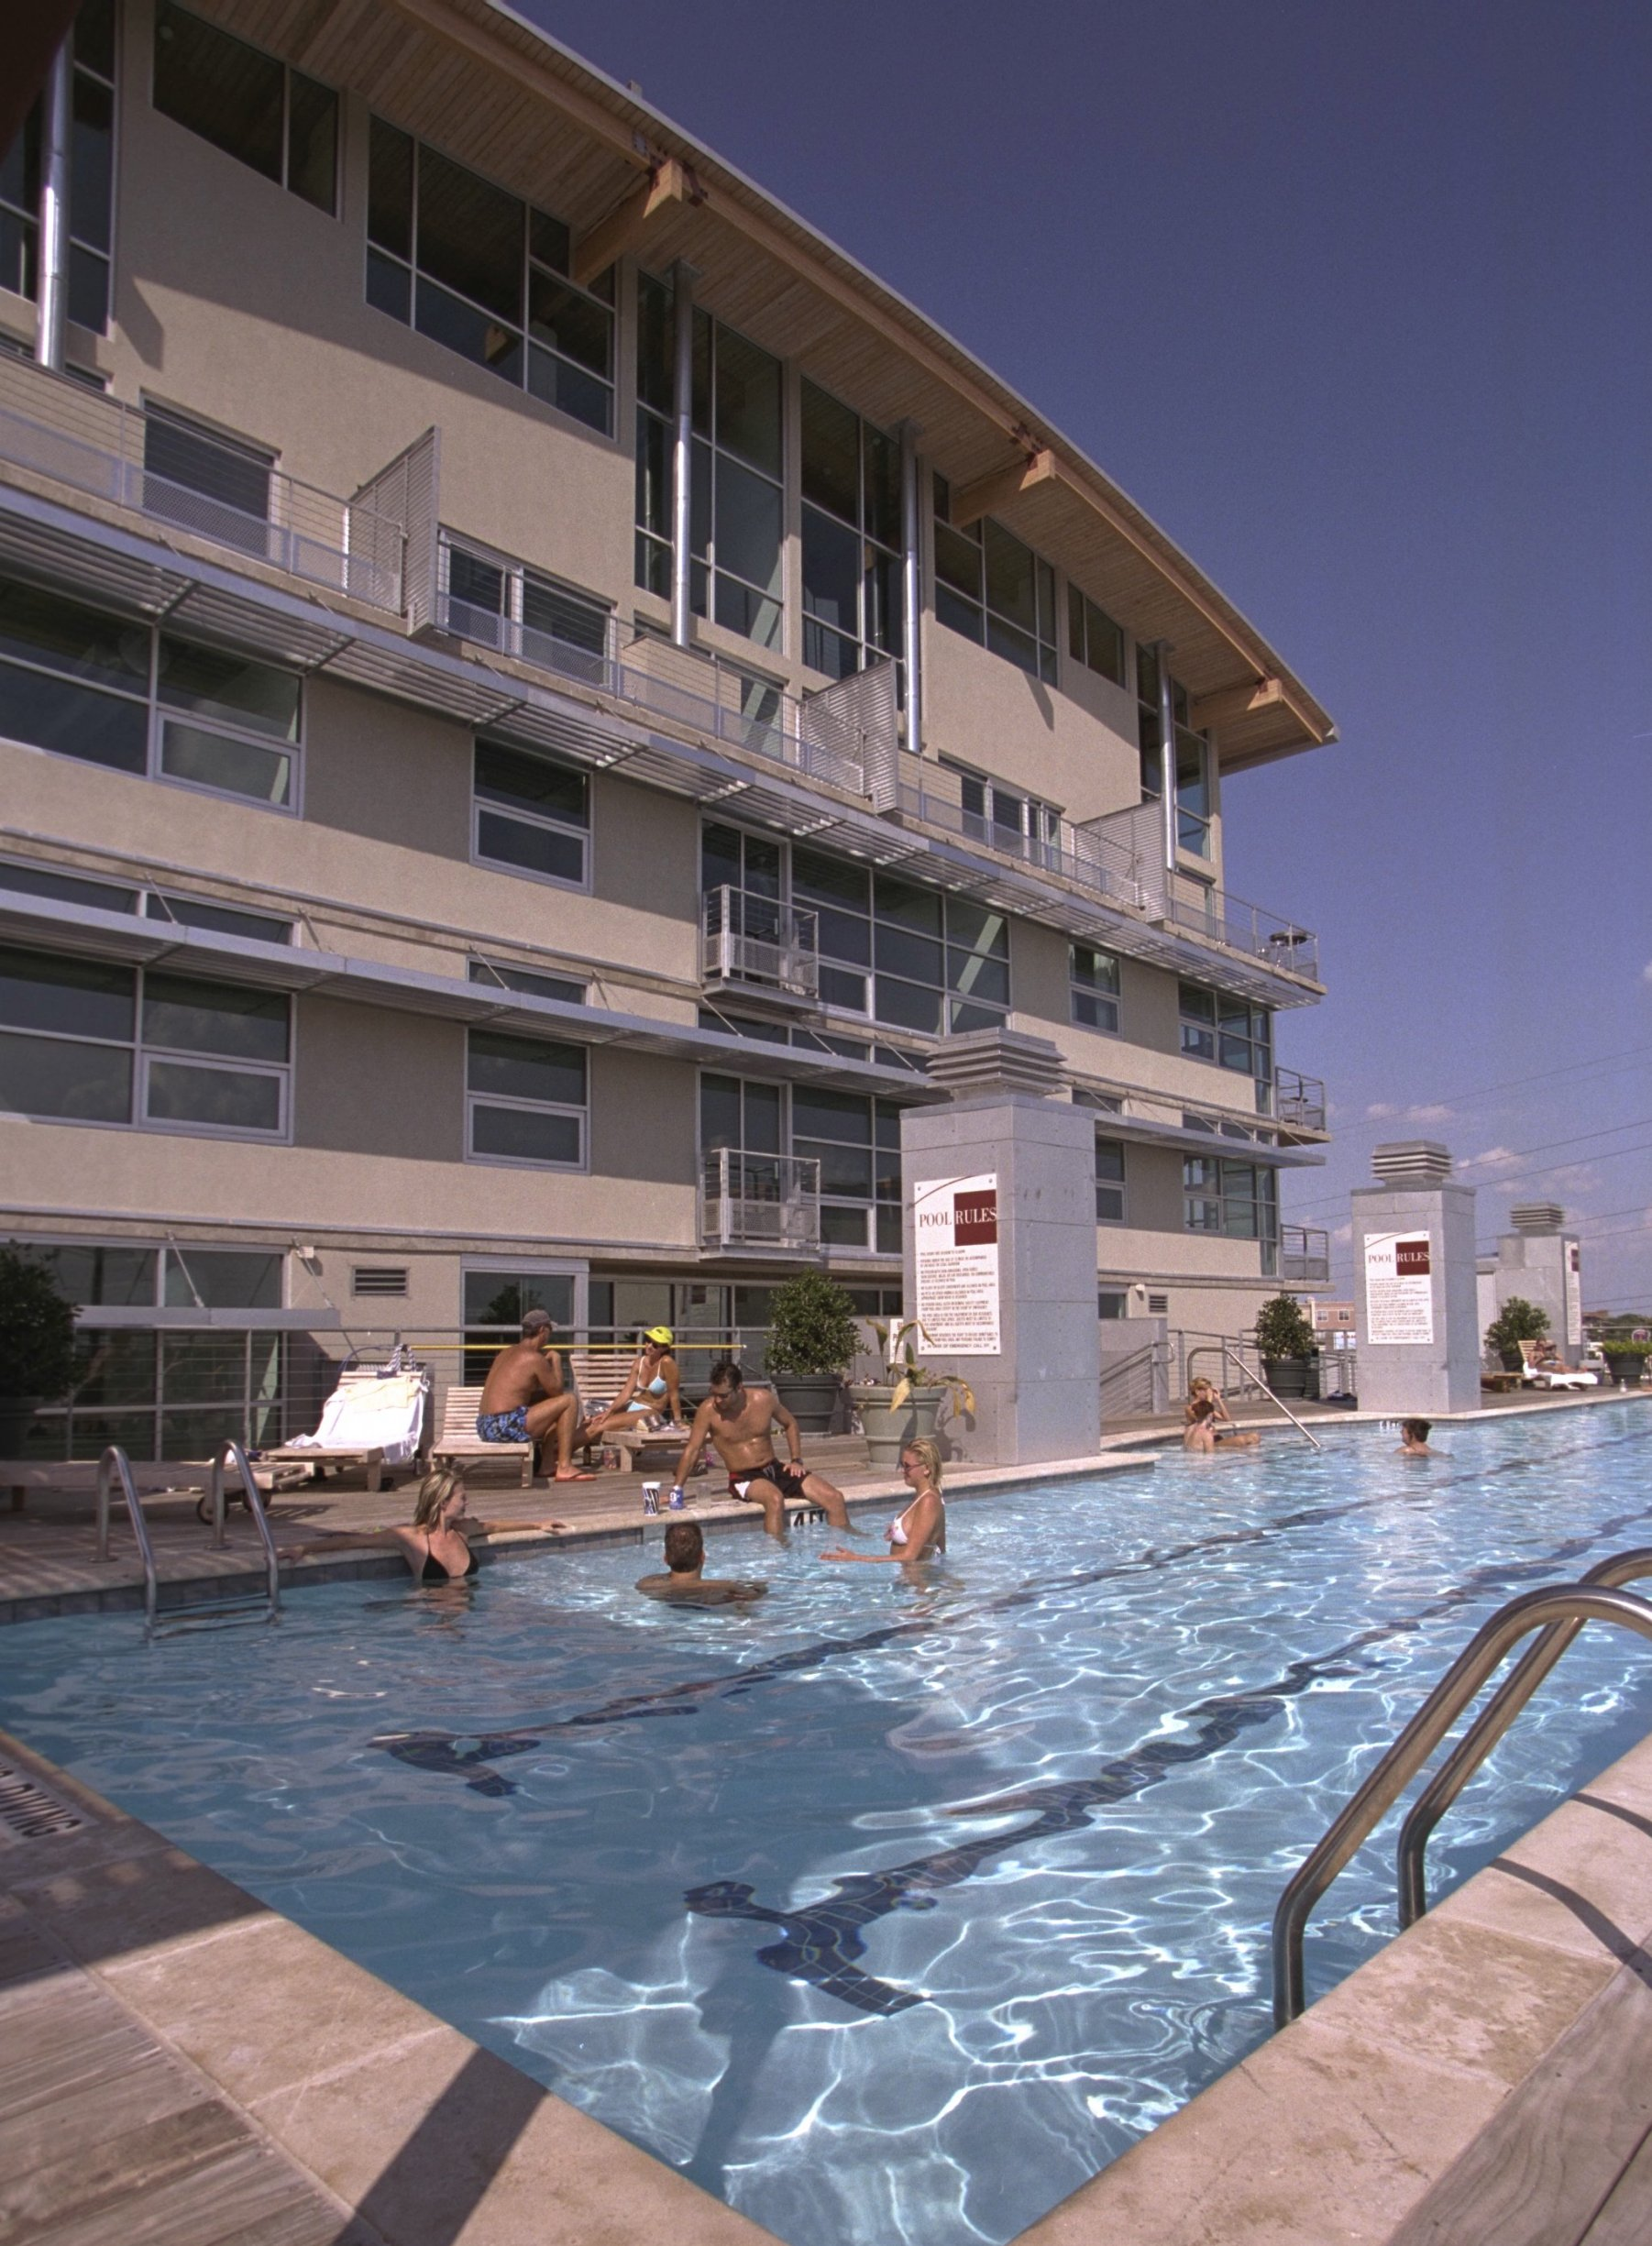 Chaparral Creek Apartments Irving